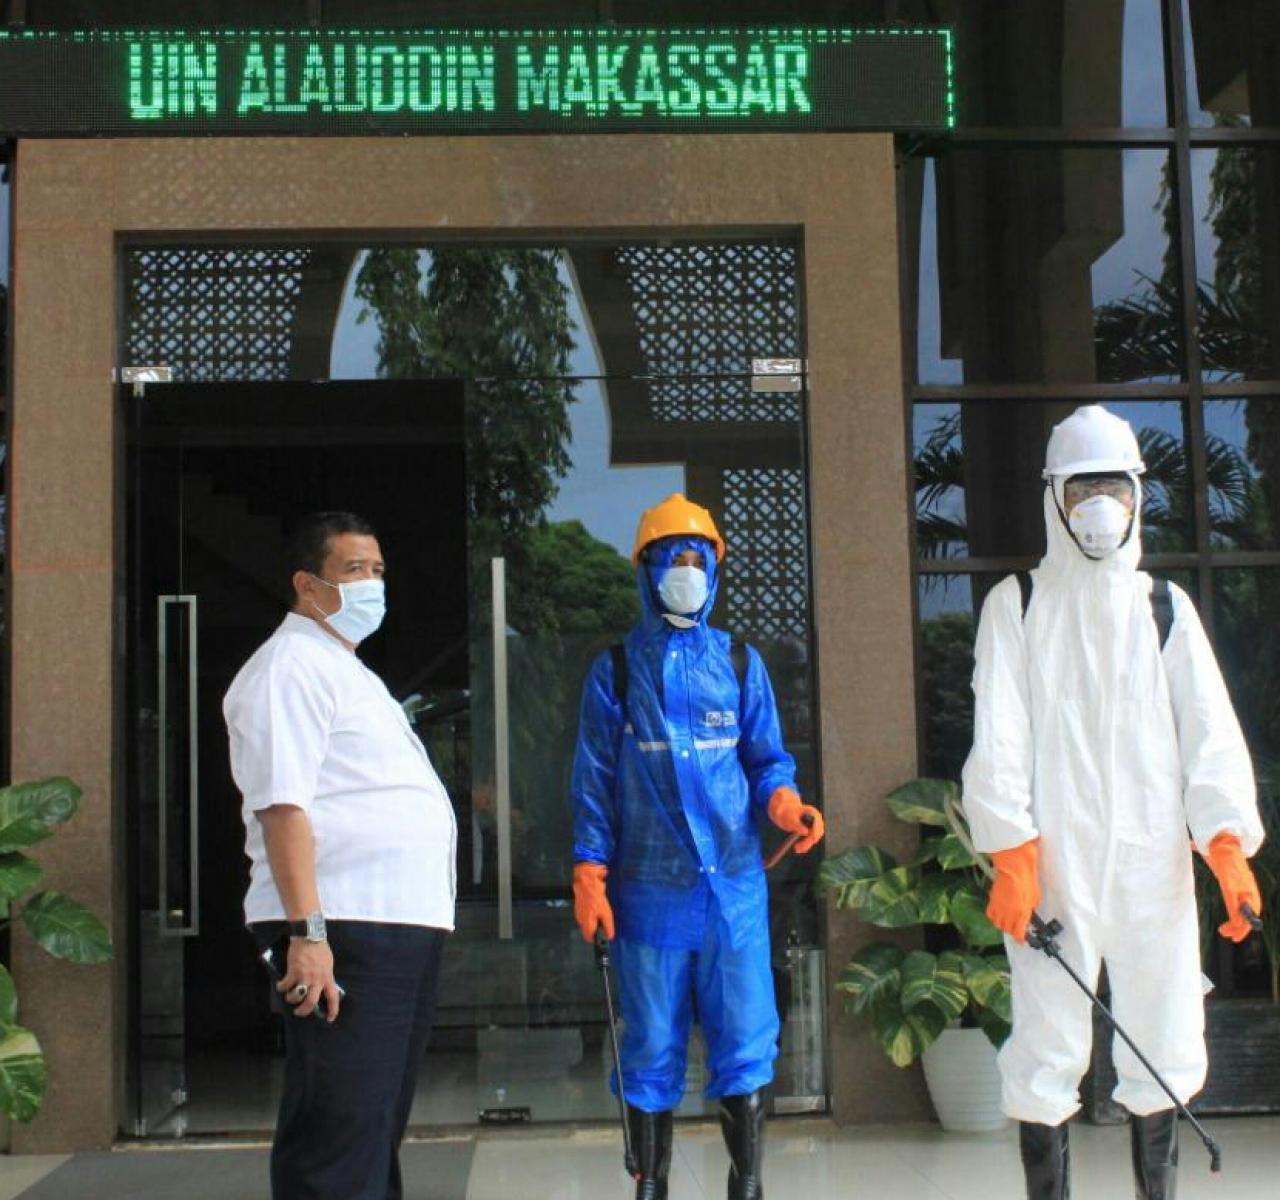 Wakil Rektor II, Ajak Masyarakat Periksakan Diri di Poliklinik UIN Alauddin